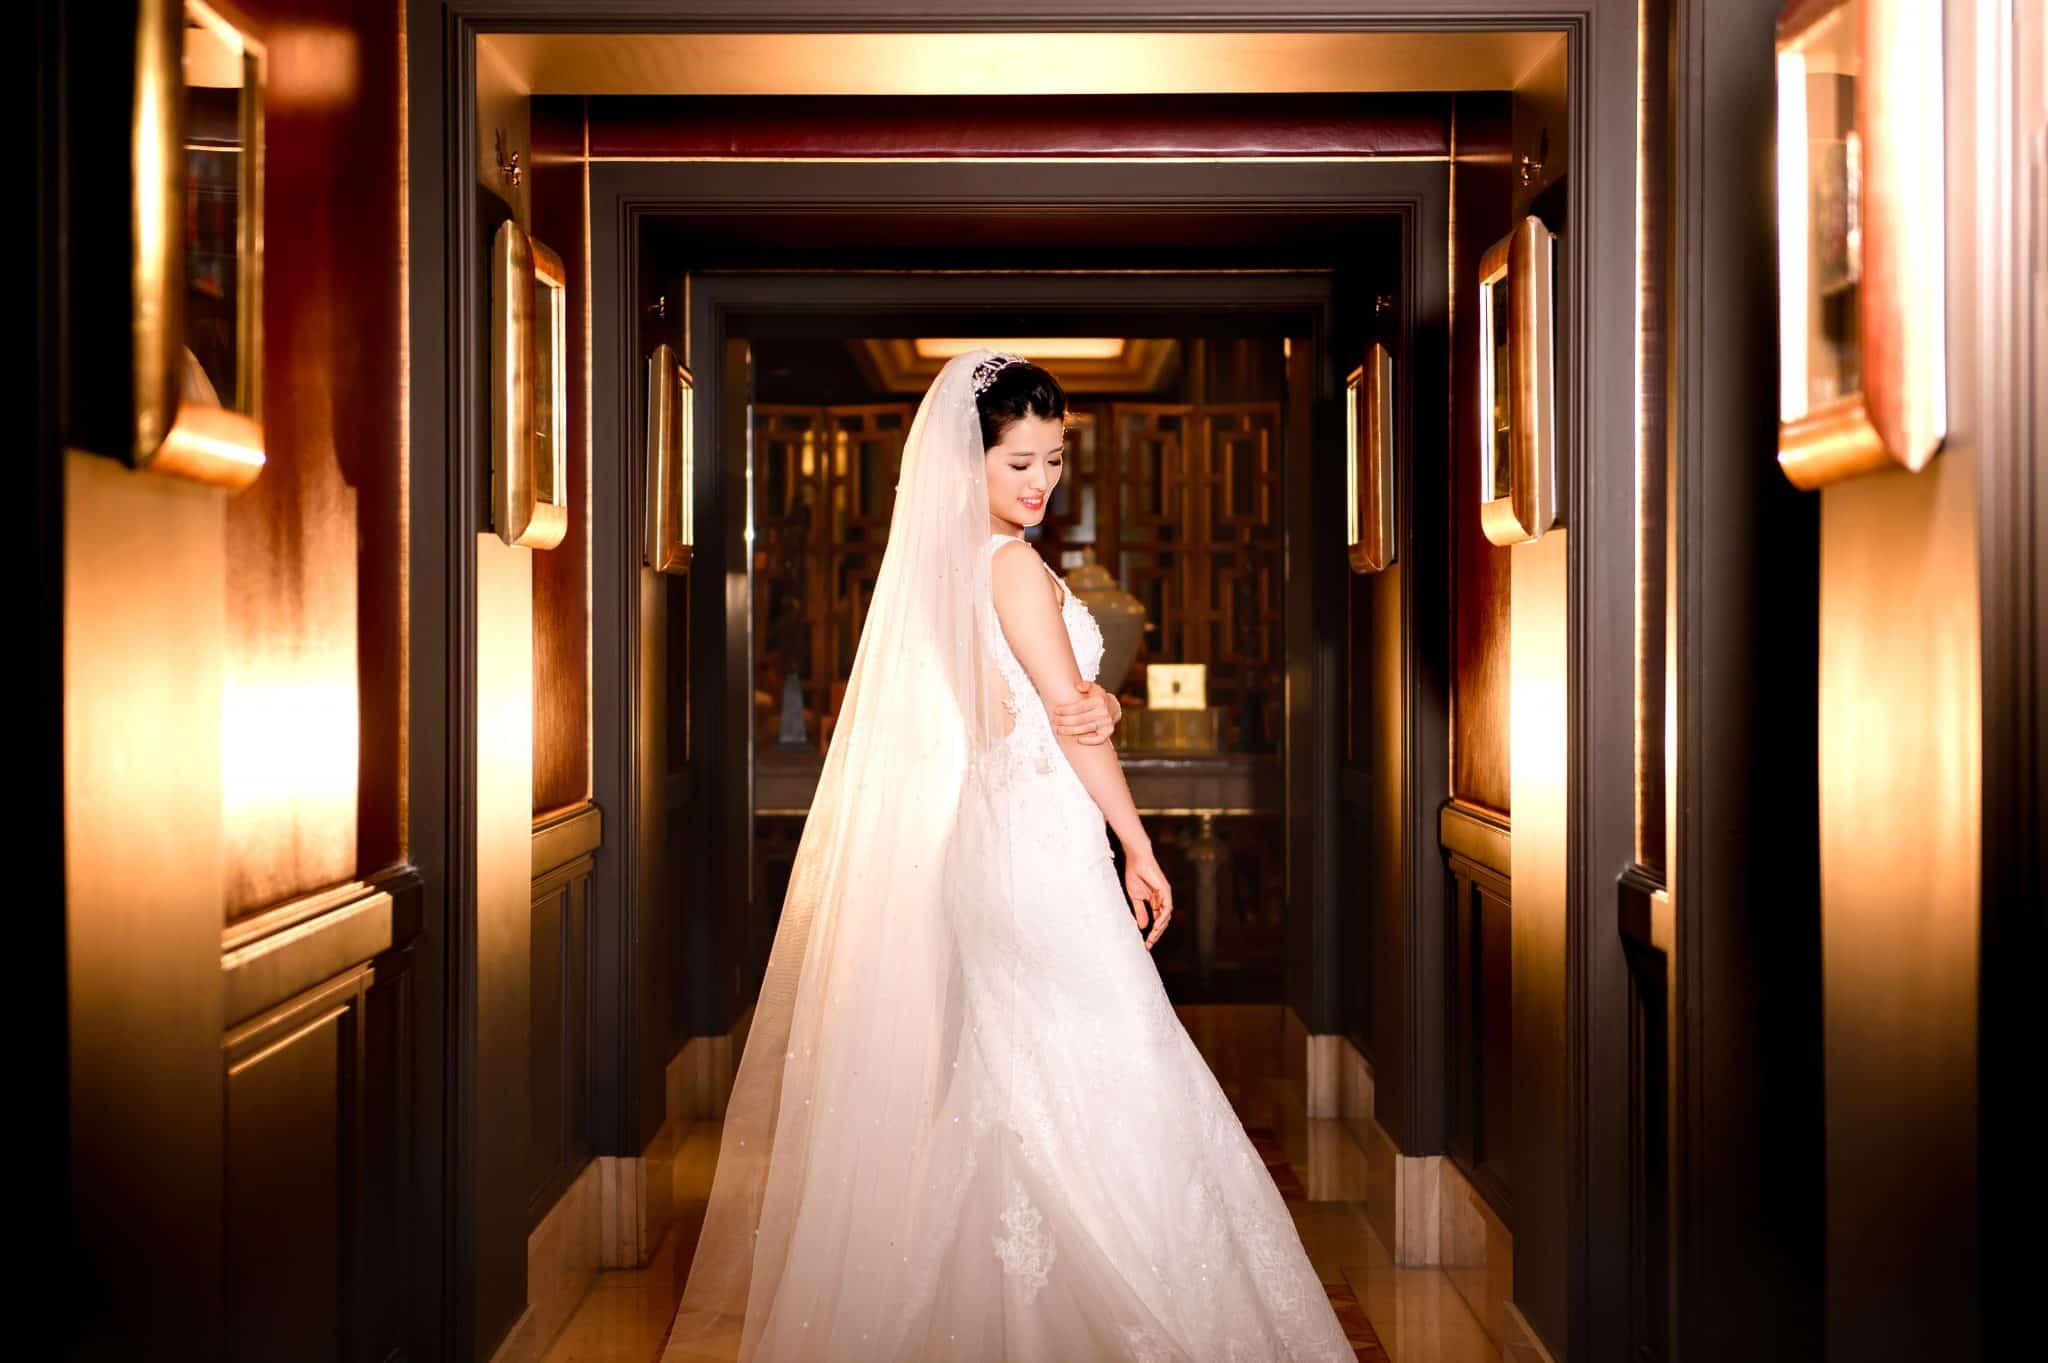 【婚攝優哥】Chi-Ting ♥ Hua-Shu - 台北國賓樓外樓